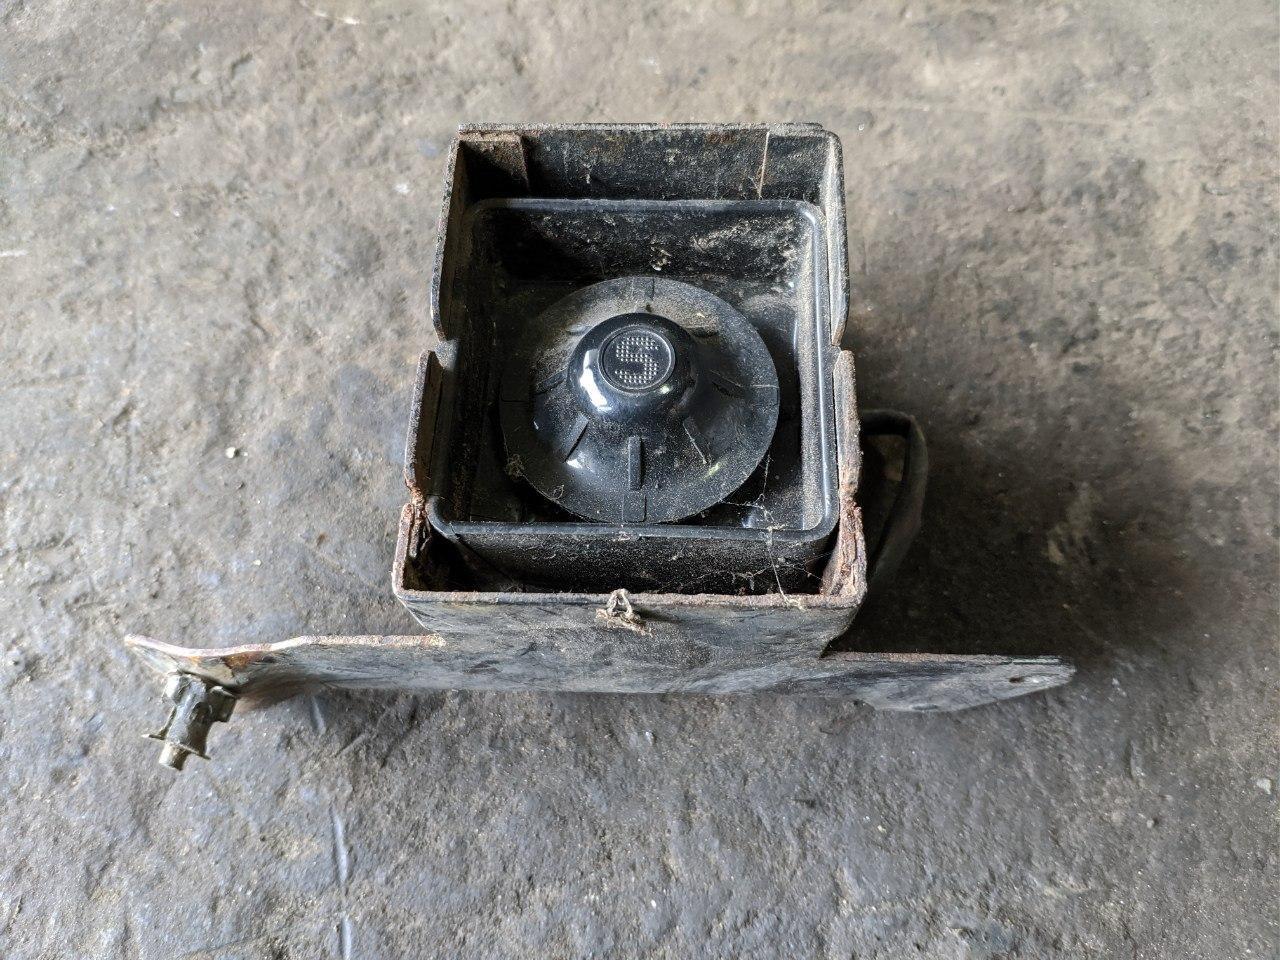 Звуковой сигнал Renault Master, Opel Movano 1998-2010, 8200257777 (Б/У)